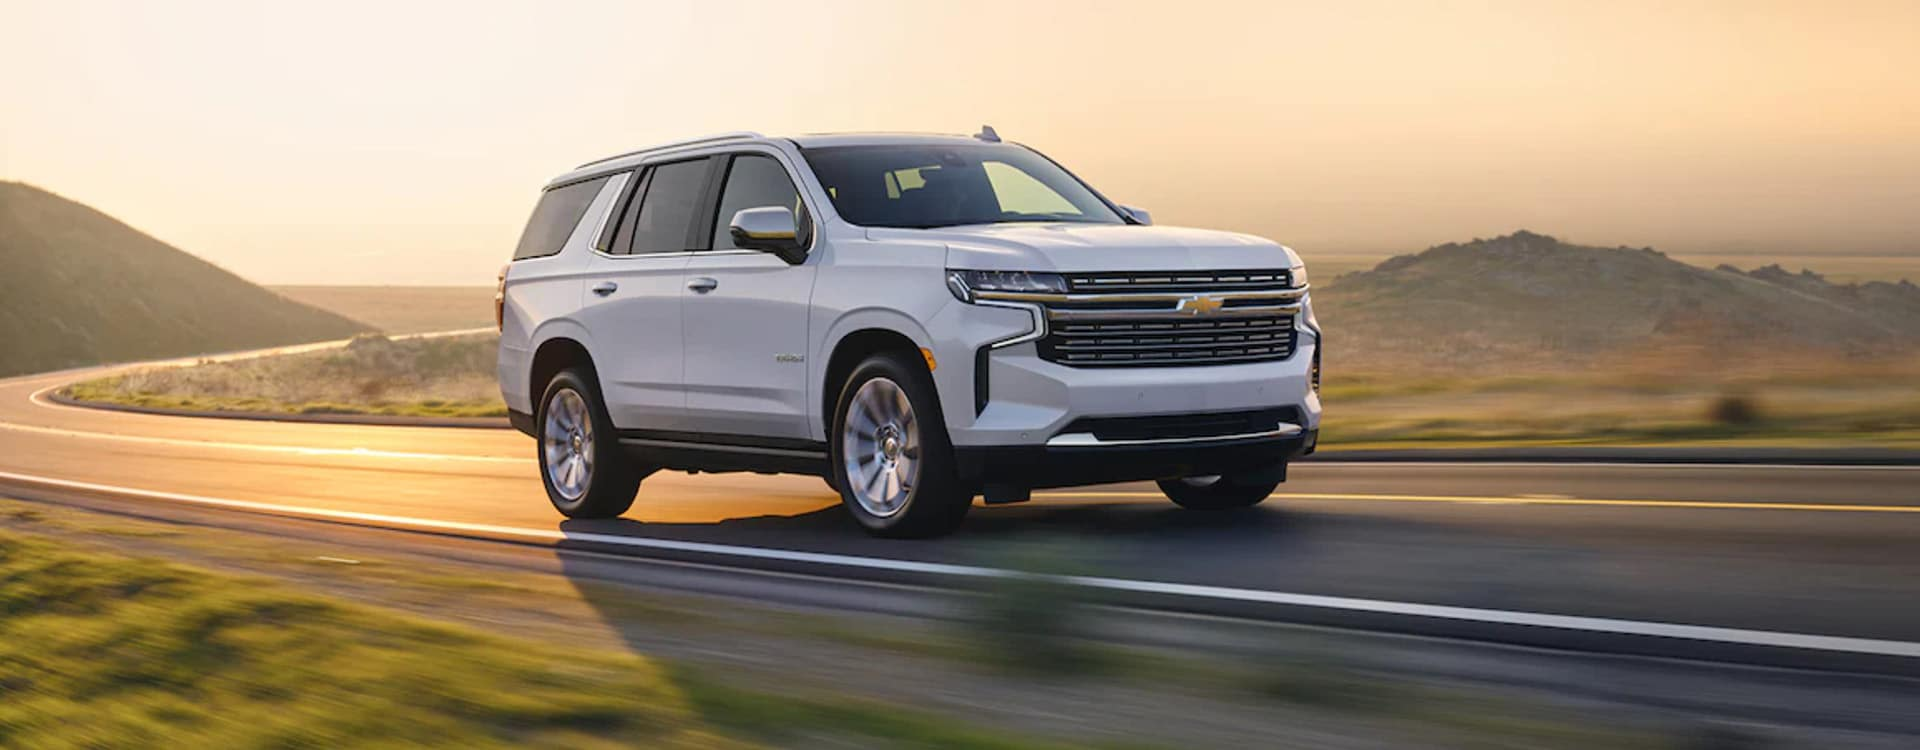 2021 Chevrolet Tahoe in St. Louis